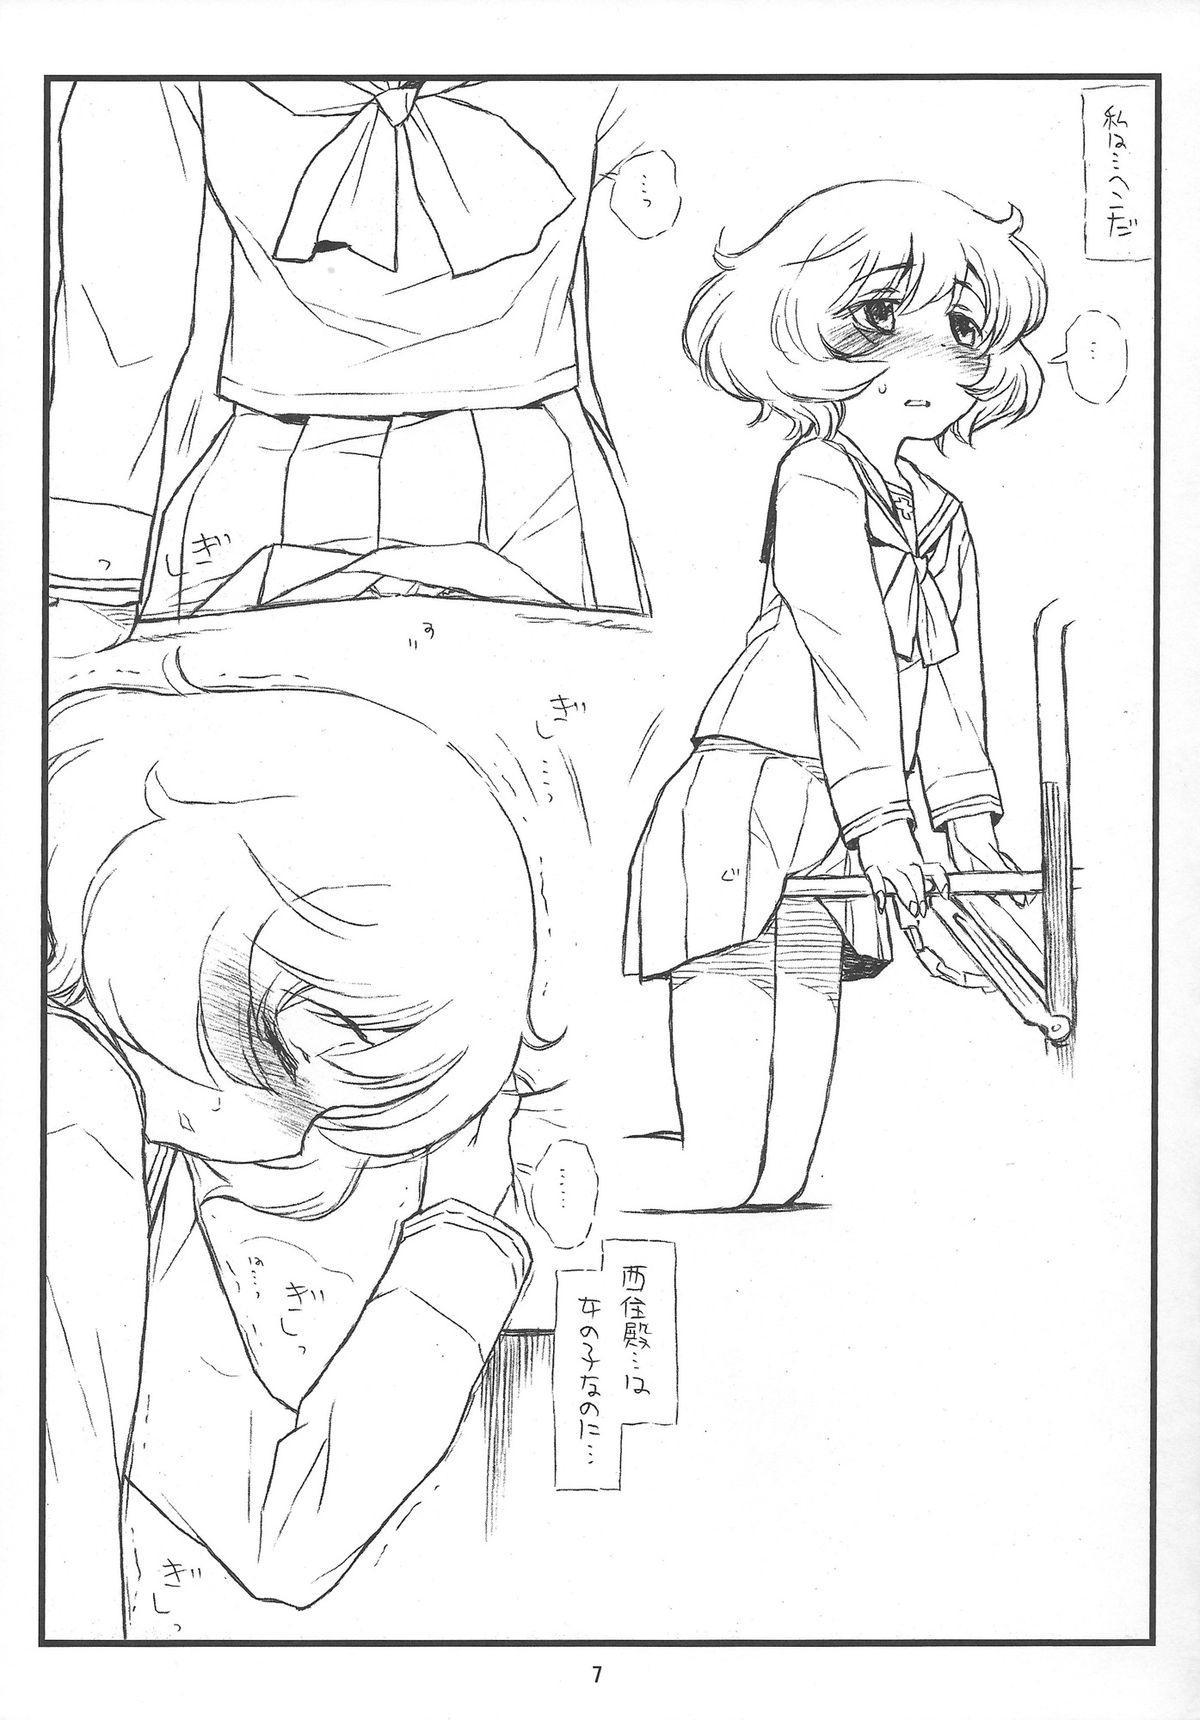 (C84) [bolze.] 「Honanie + Akiyama-dono Sennyudaisakusen (Sippai)」 (Girls und Panzer) 6